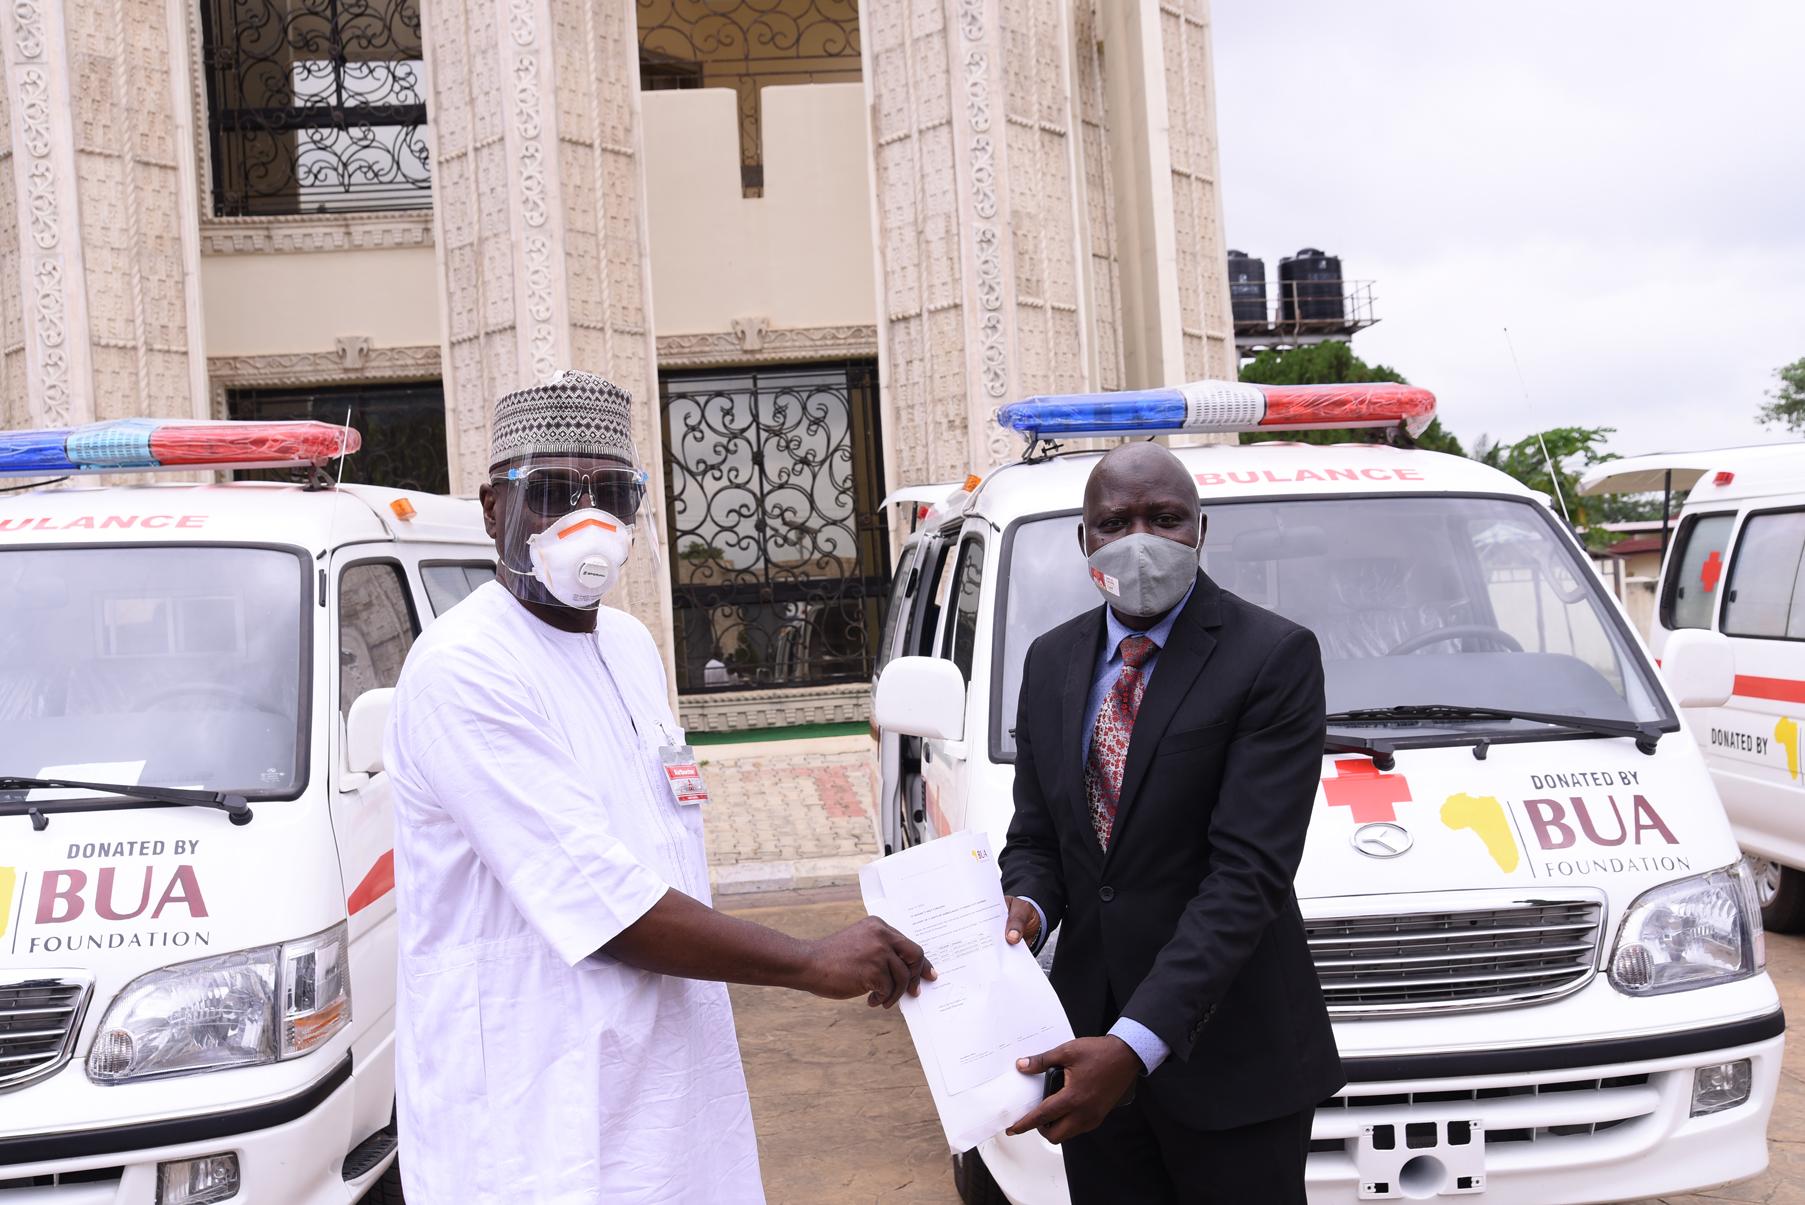 BUA Donates 6 Ambulances, N200m To Rivers, Kwara As COVID-19 Interventions